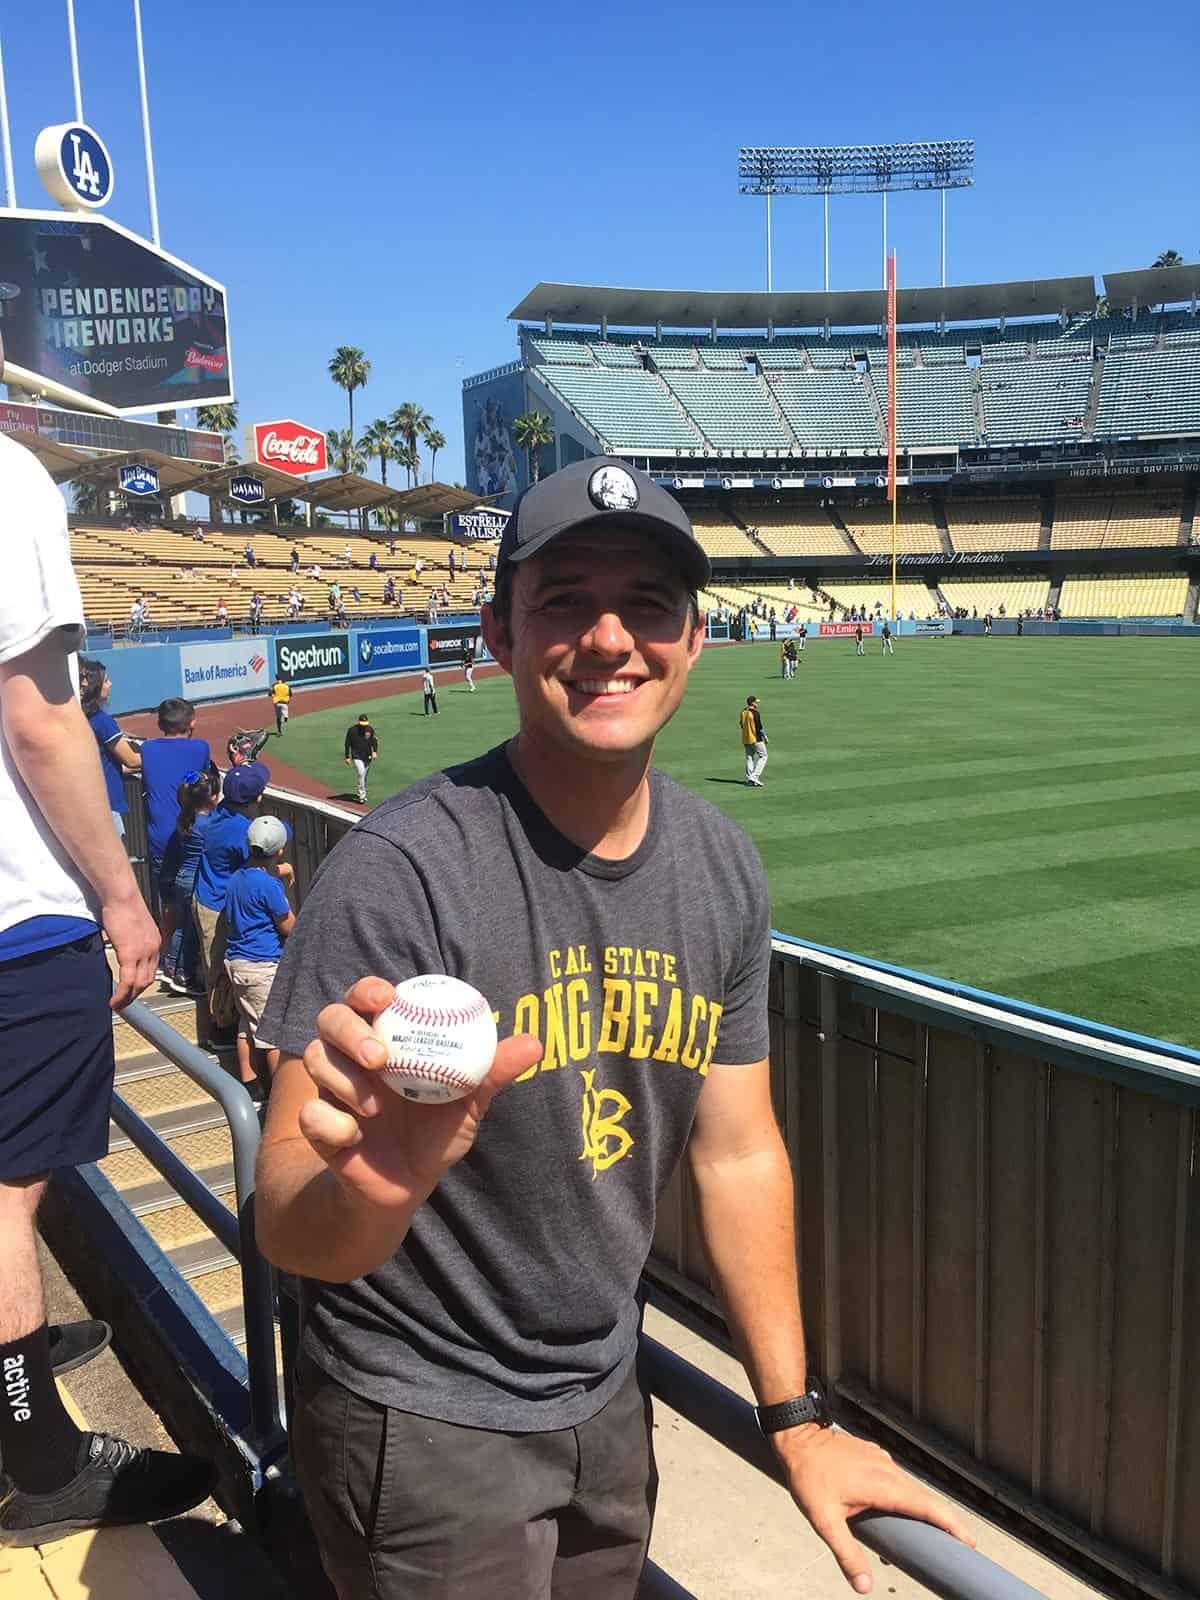 Ryan Hansard catches pre-game ball at LA Dodgers game